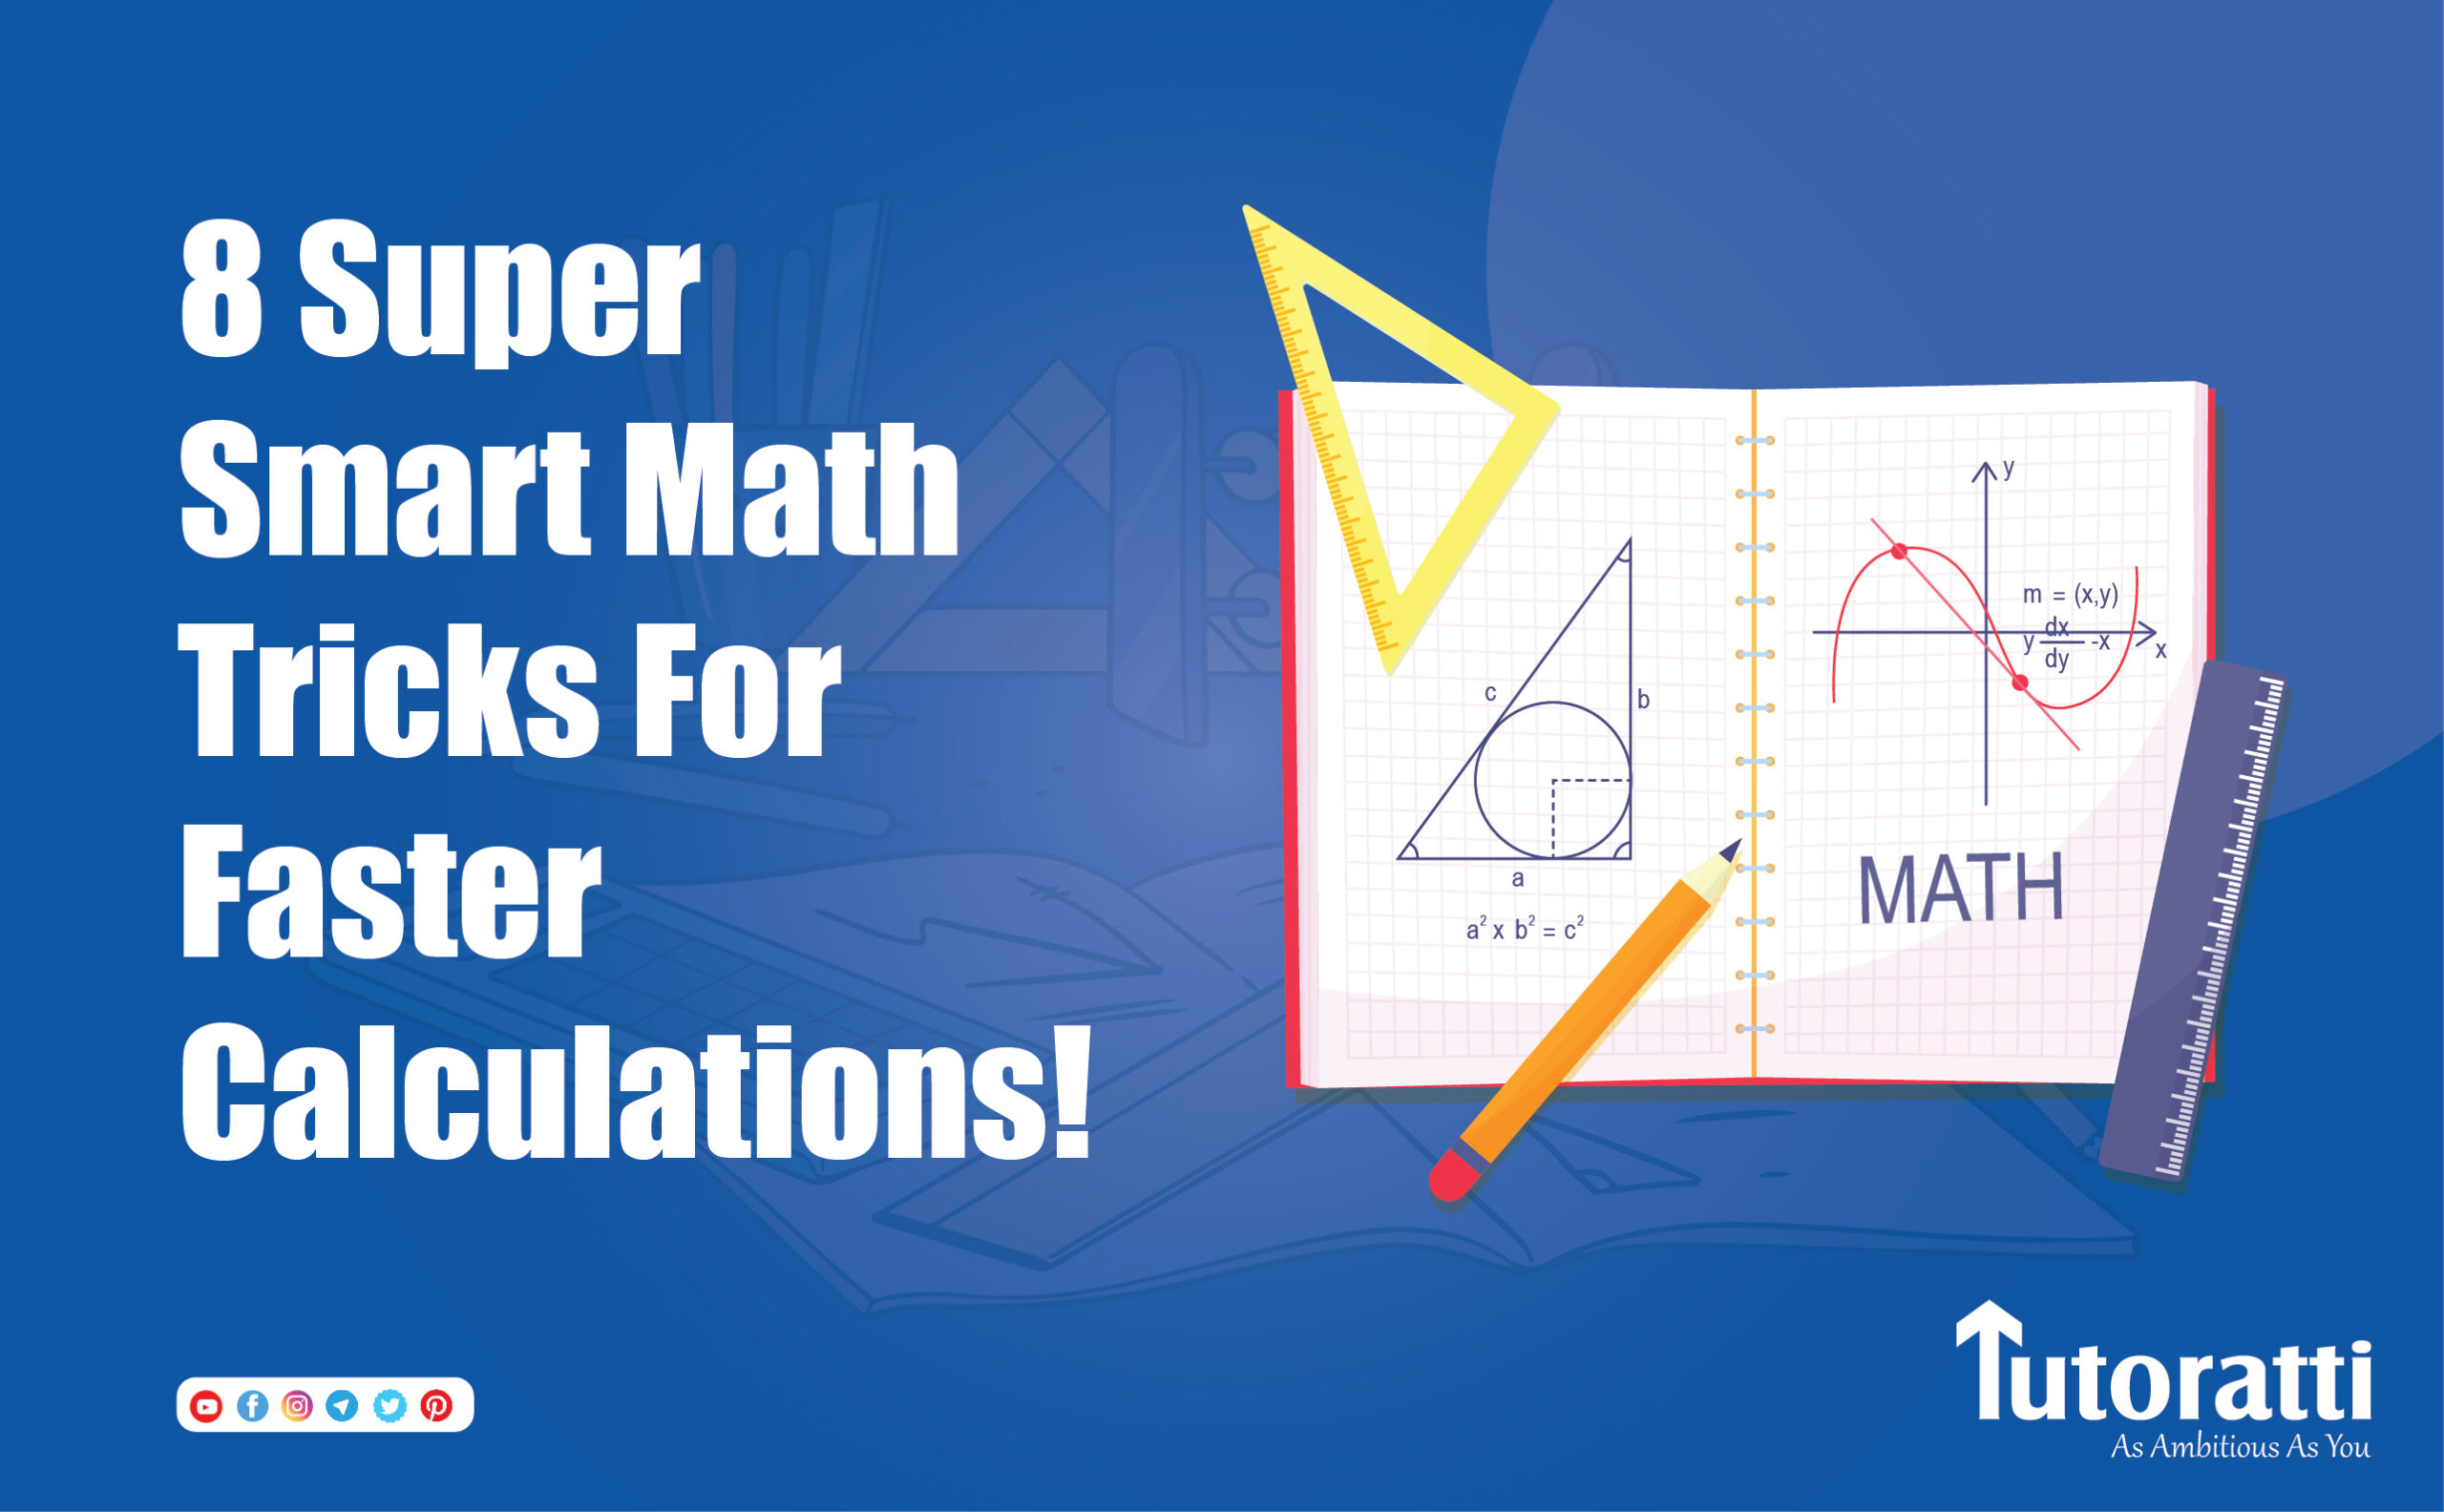 8 Super Smart Math Tricks For Faster Calculations!